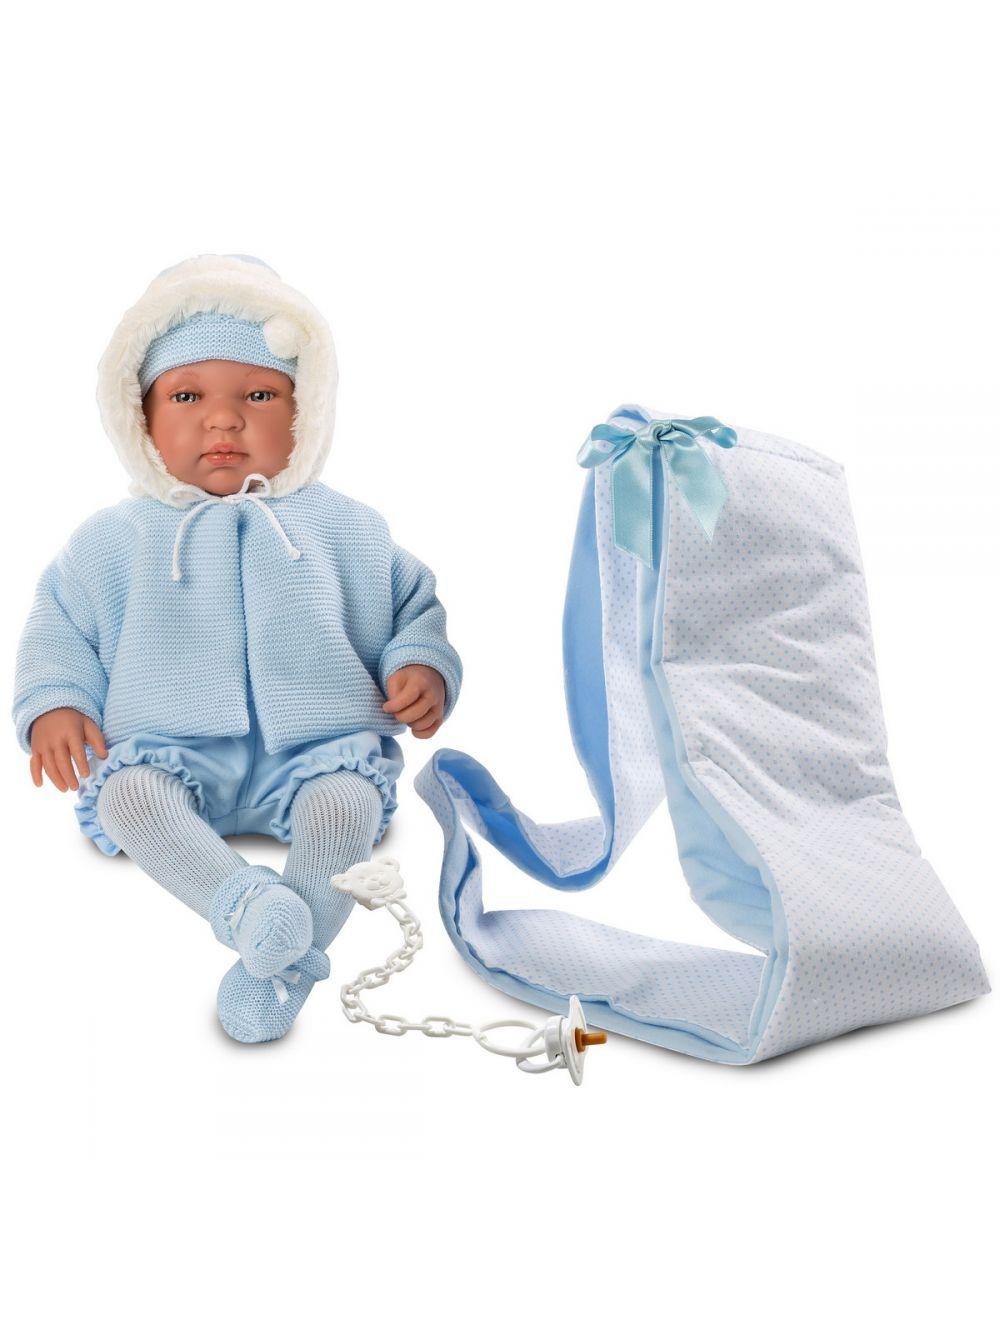 Llorens 84421 Lalka płacząca bobas Bebo 44 cm błękitna chusta